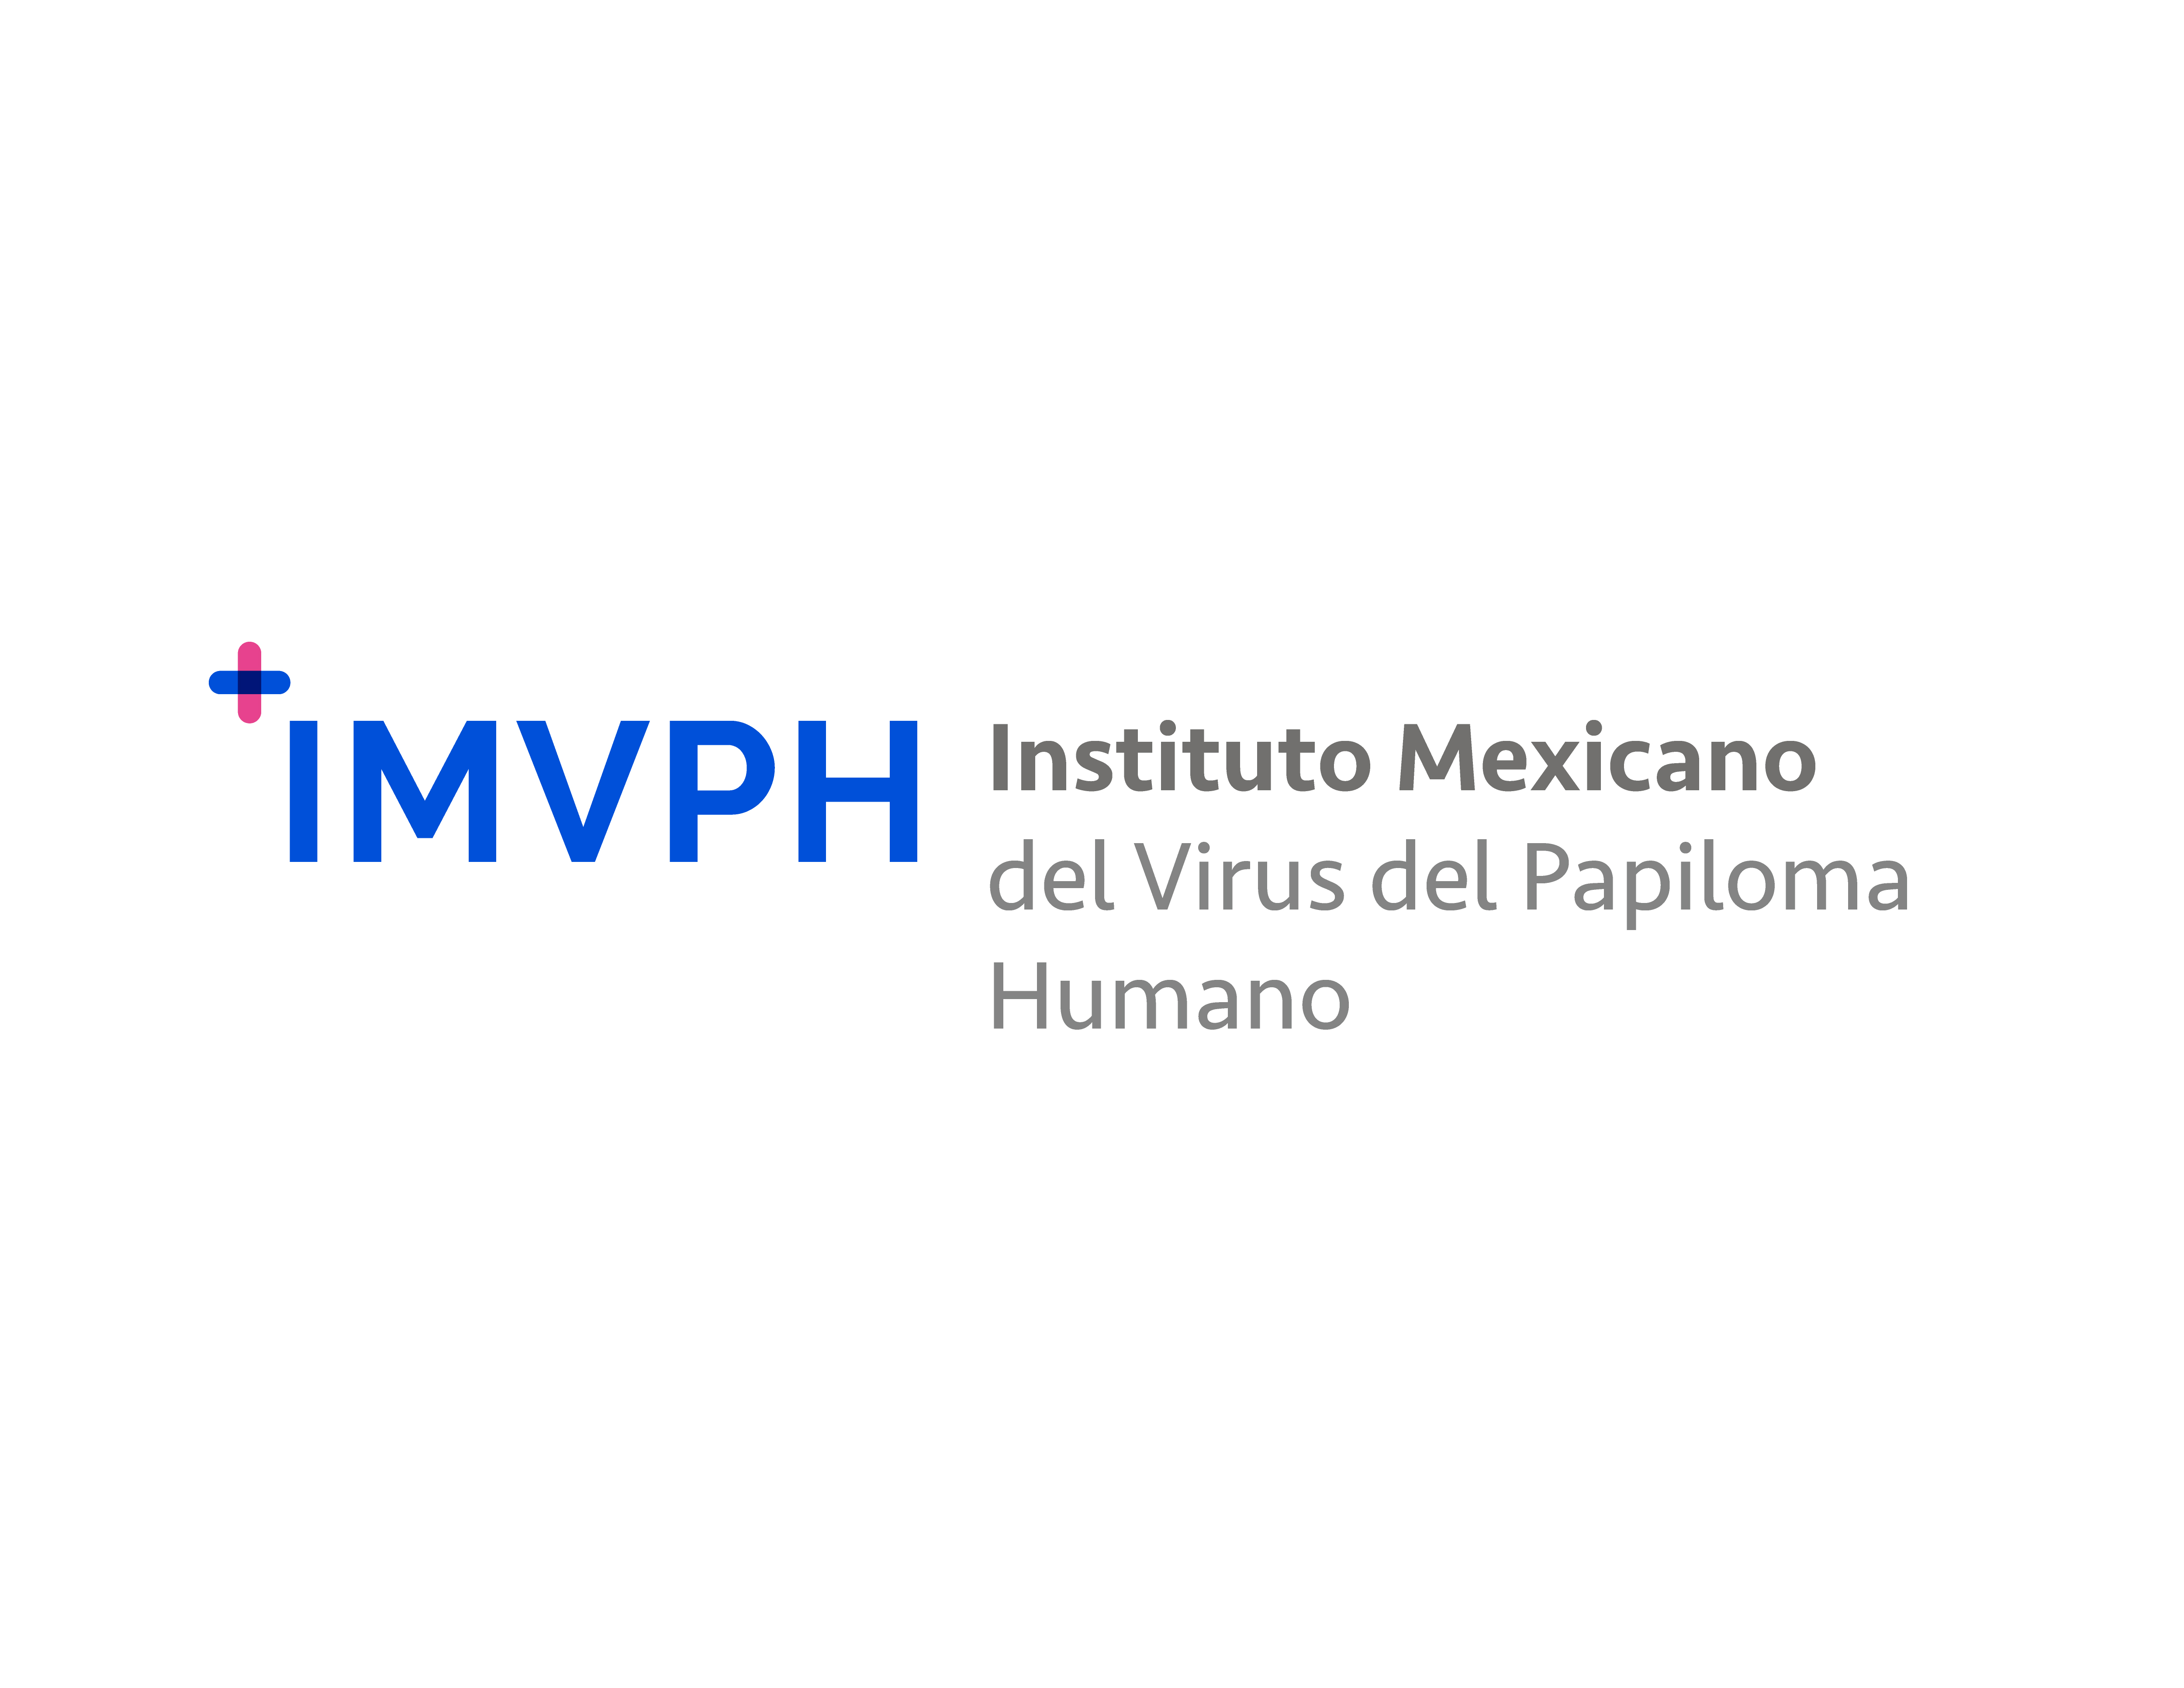 Logotipo-IMVPH-HD-1